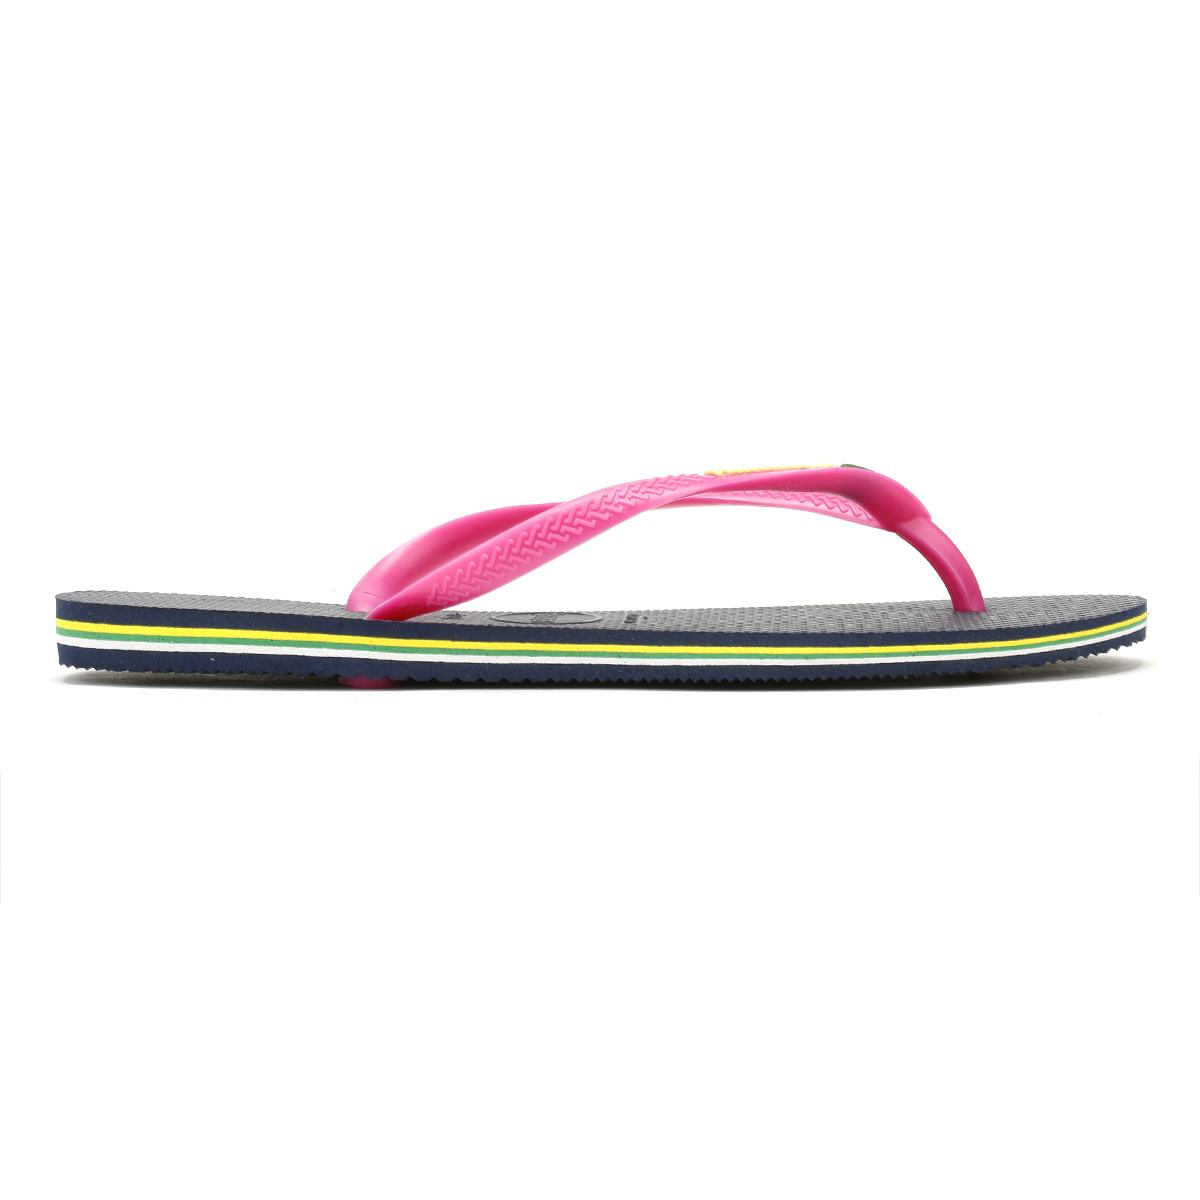 e32eec33c27893 Havaianas Slim Brasil Logo Womens Navy Pink Rubber Flip Flops - 35 ...